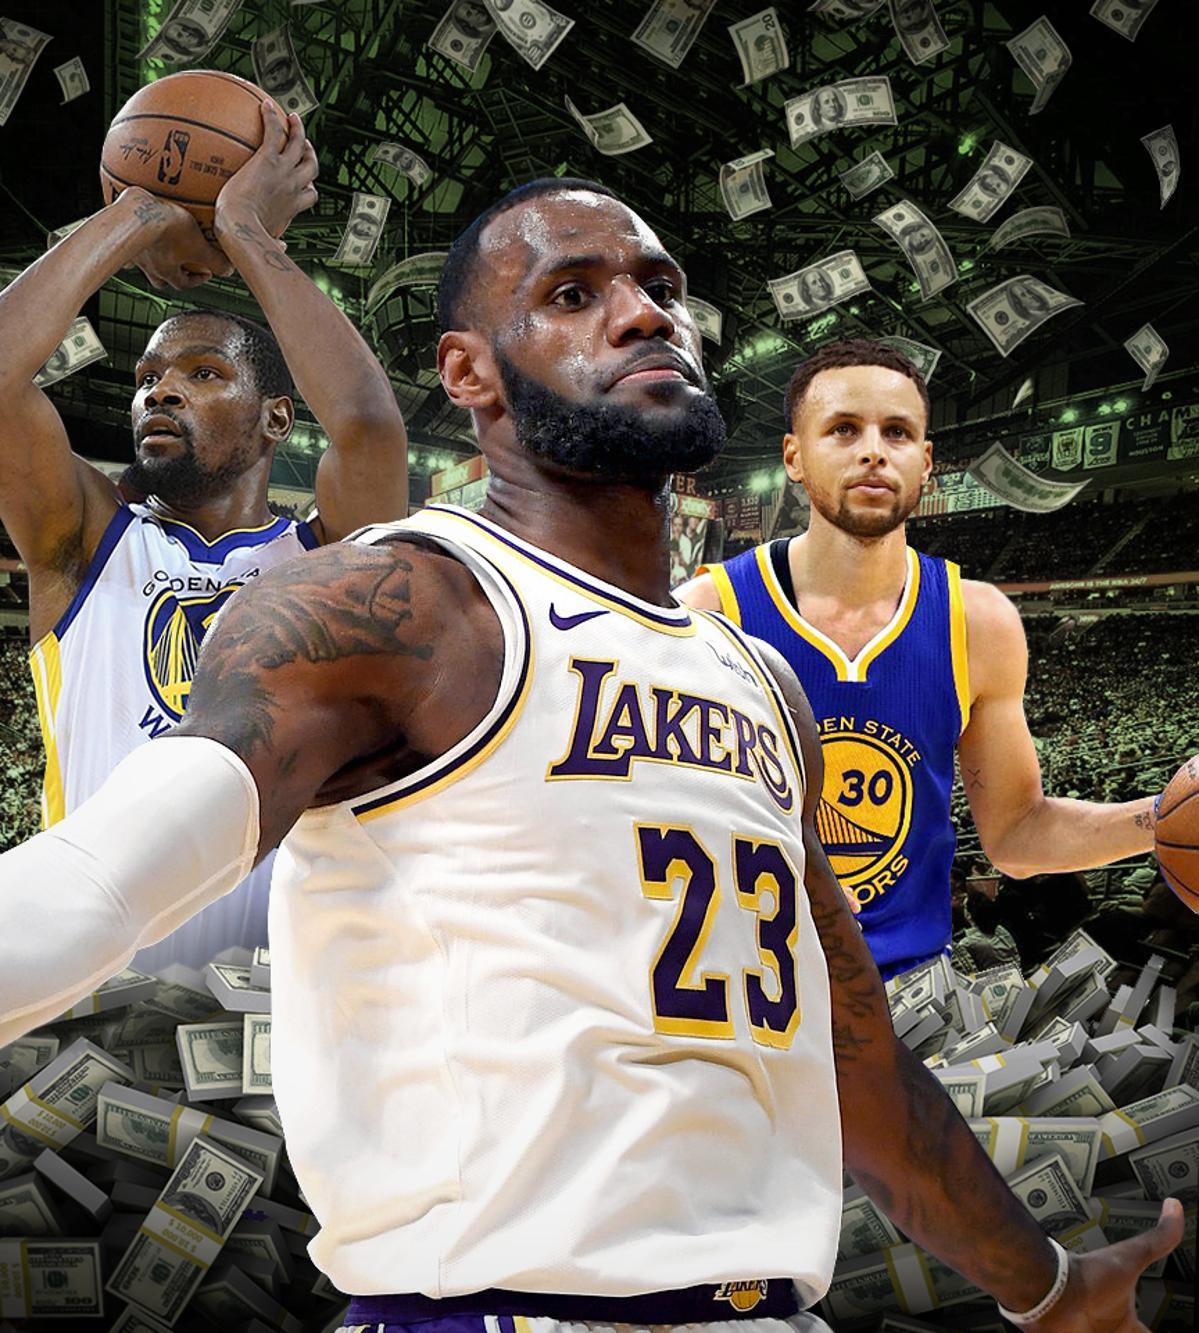 NBA Team Values 2019: Knicks On Top At $4 Billion